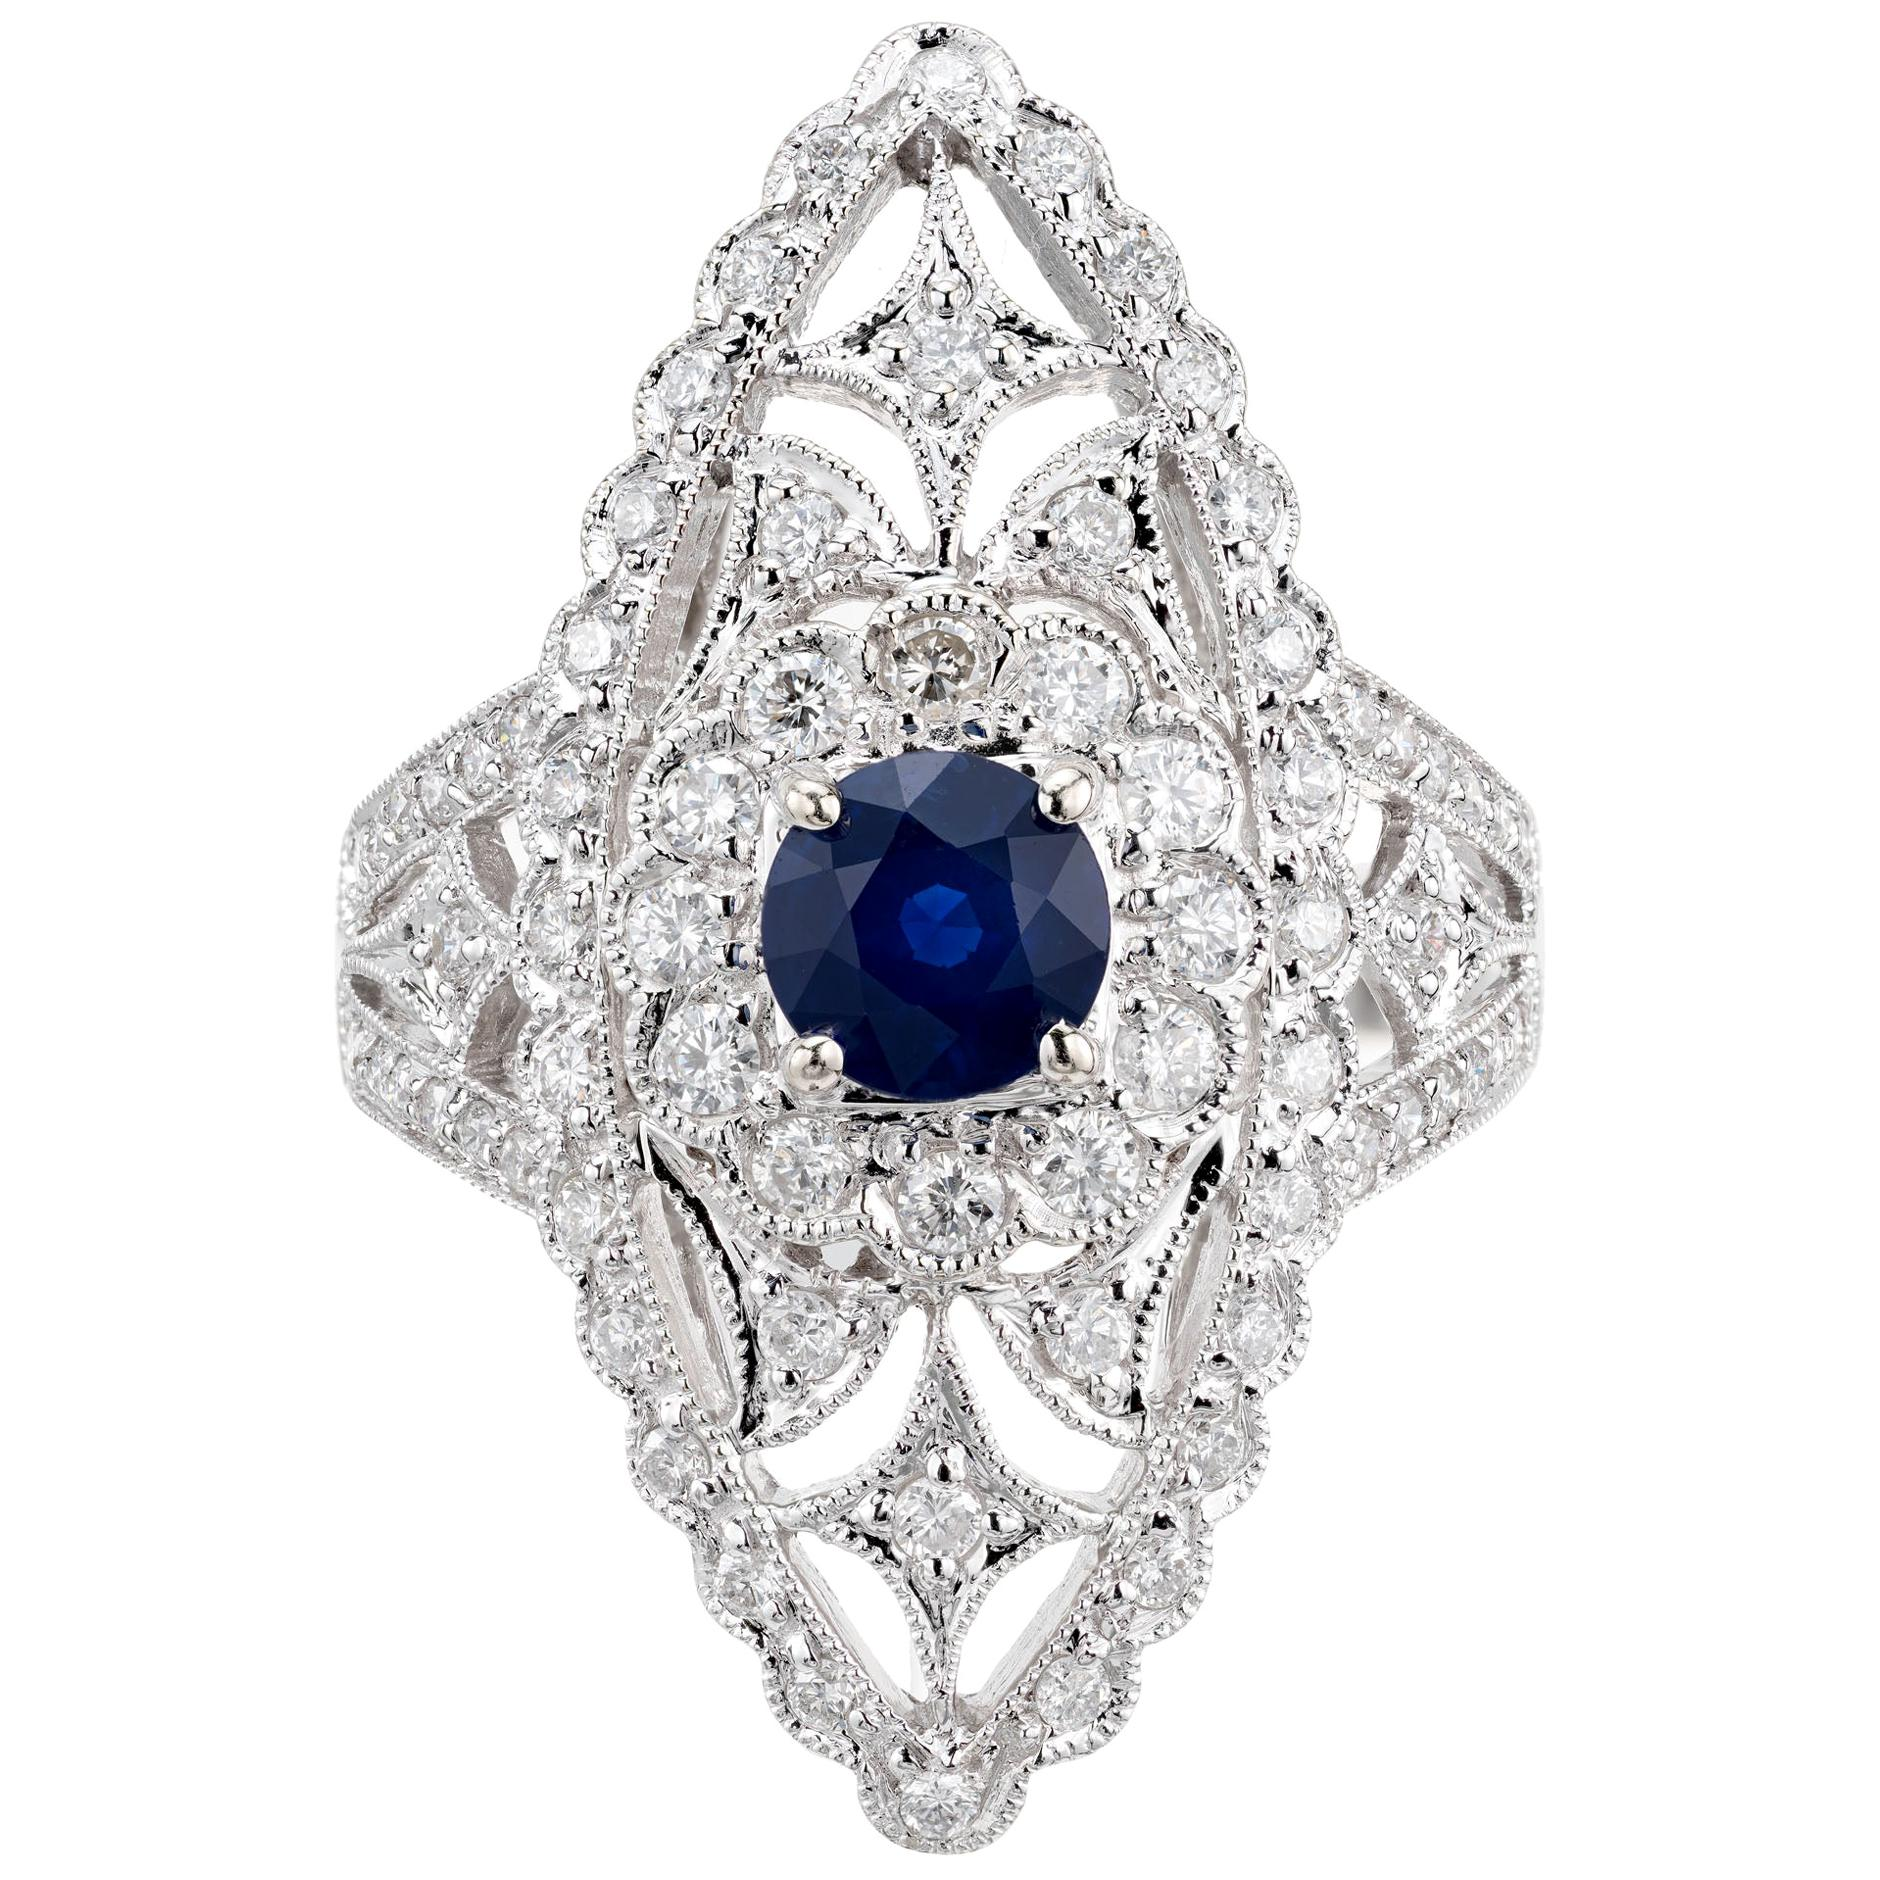 .65 Carat Blue Sapphire Diamond White Gold Cocktail Ring